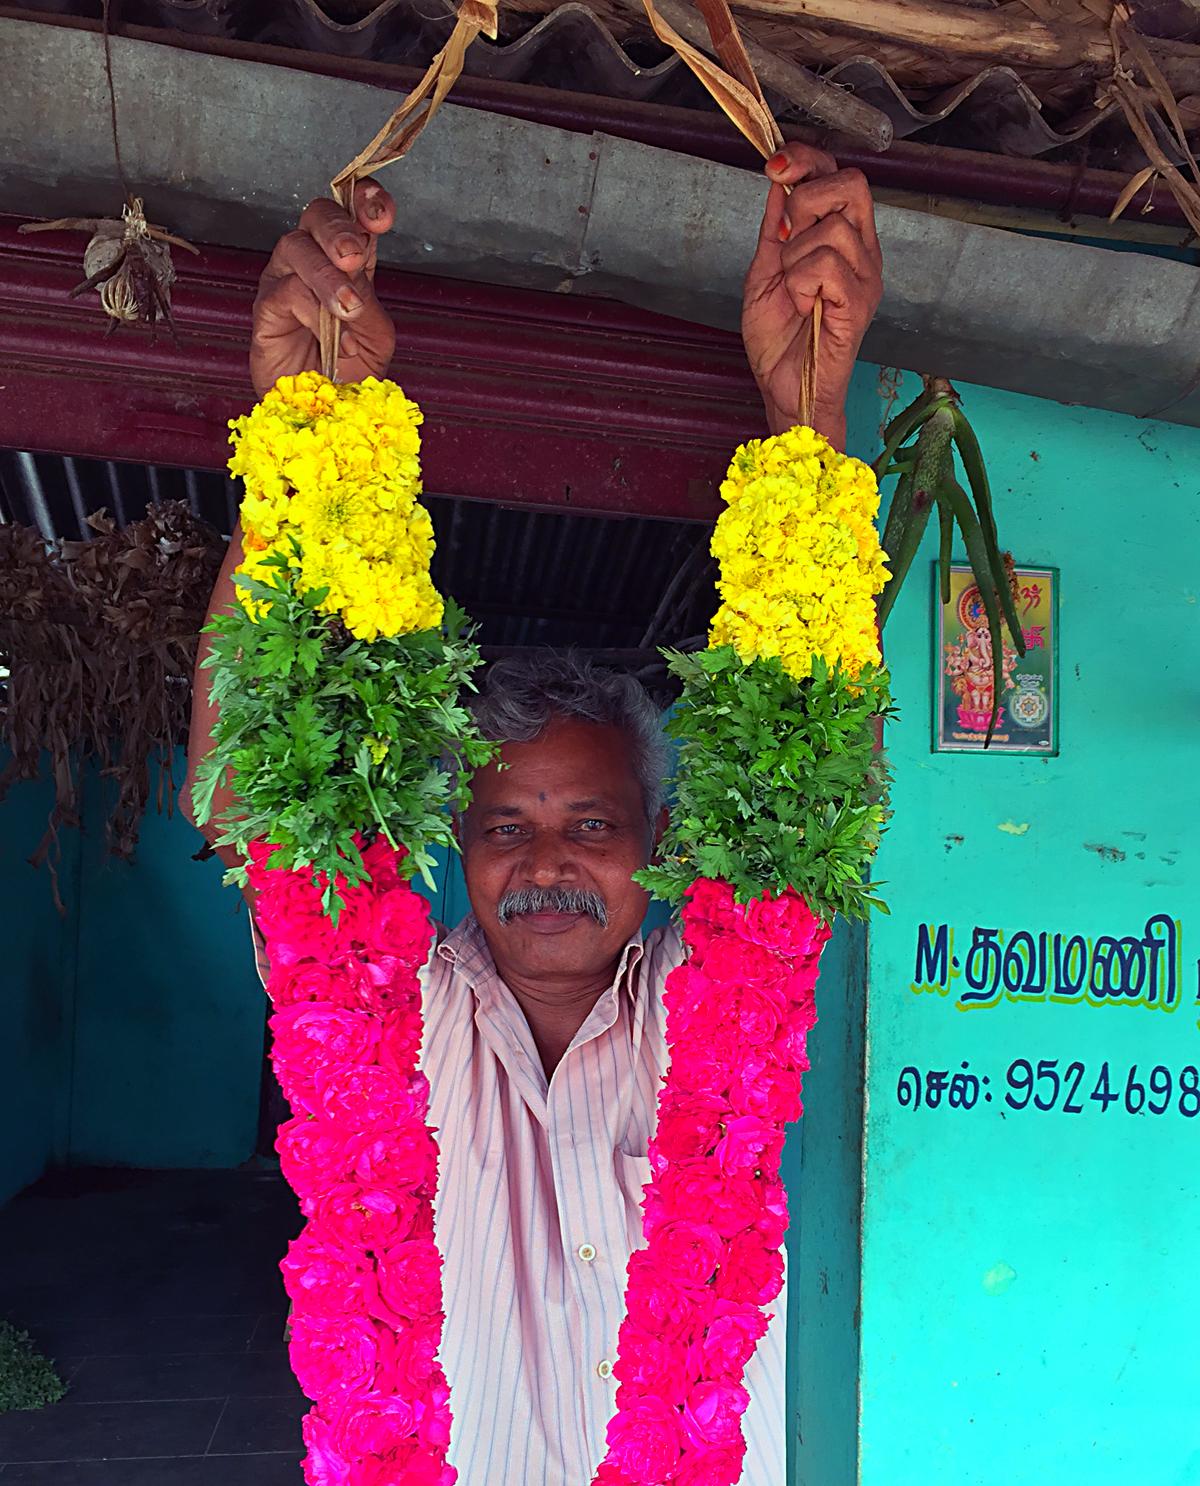 INDIEN Kumily Thekkady Kumarakom Kerala Menschen Tempel FINEST-onTour 2206.jpg